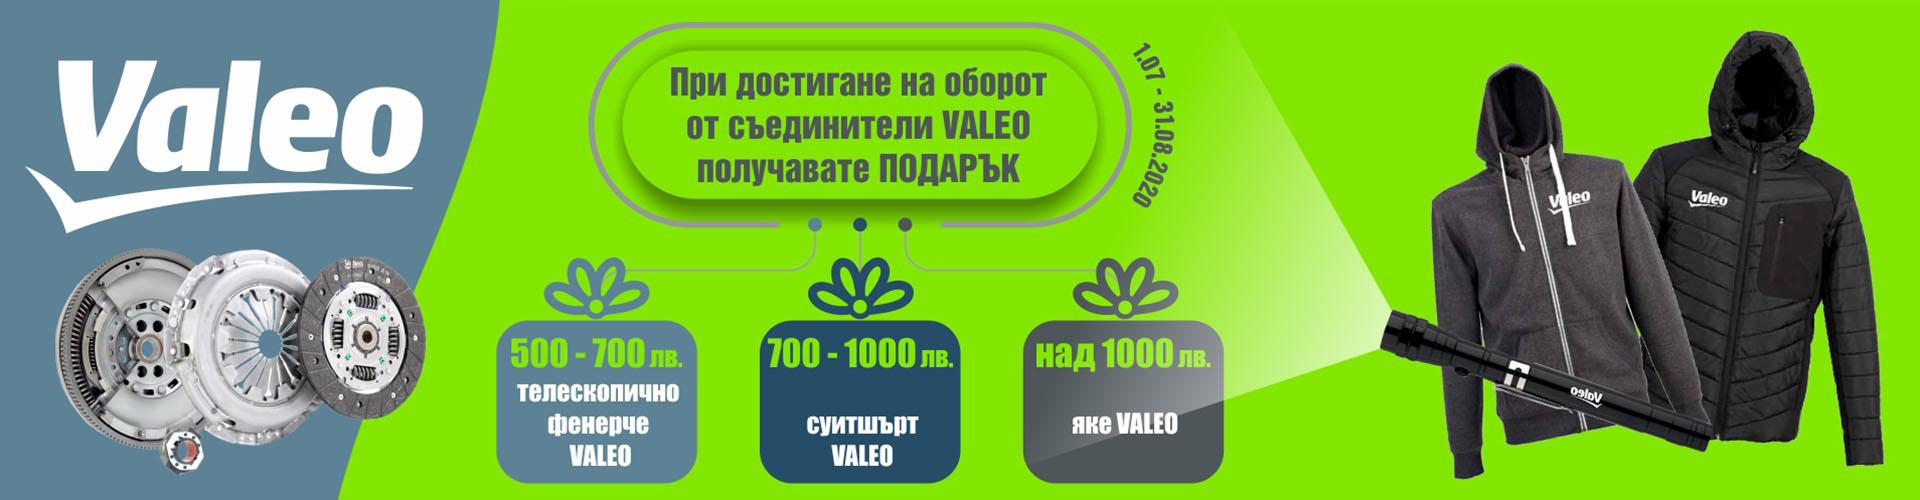 promo_valeo_clutch_01.07.2020-31.08.2020_banner.jpg